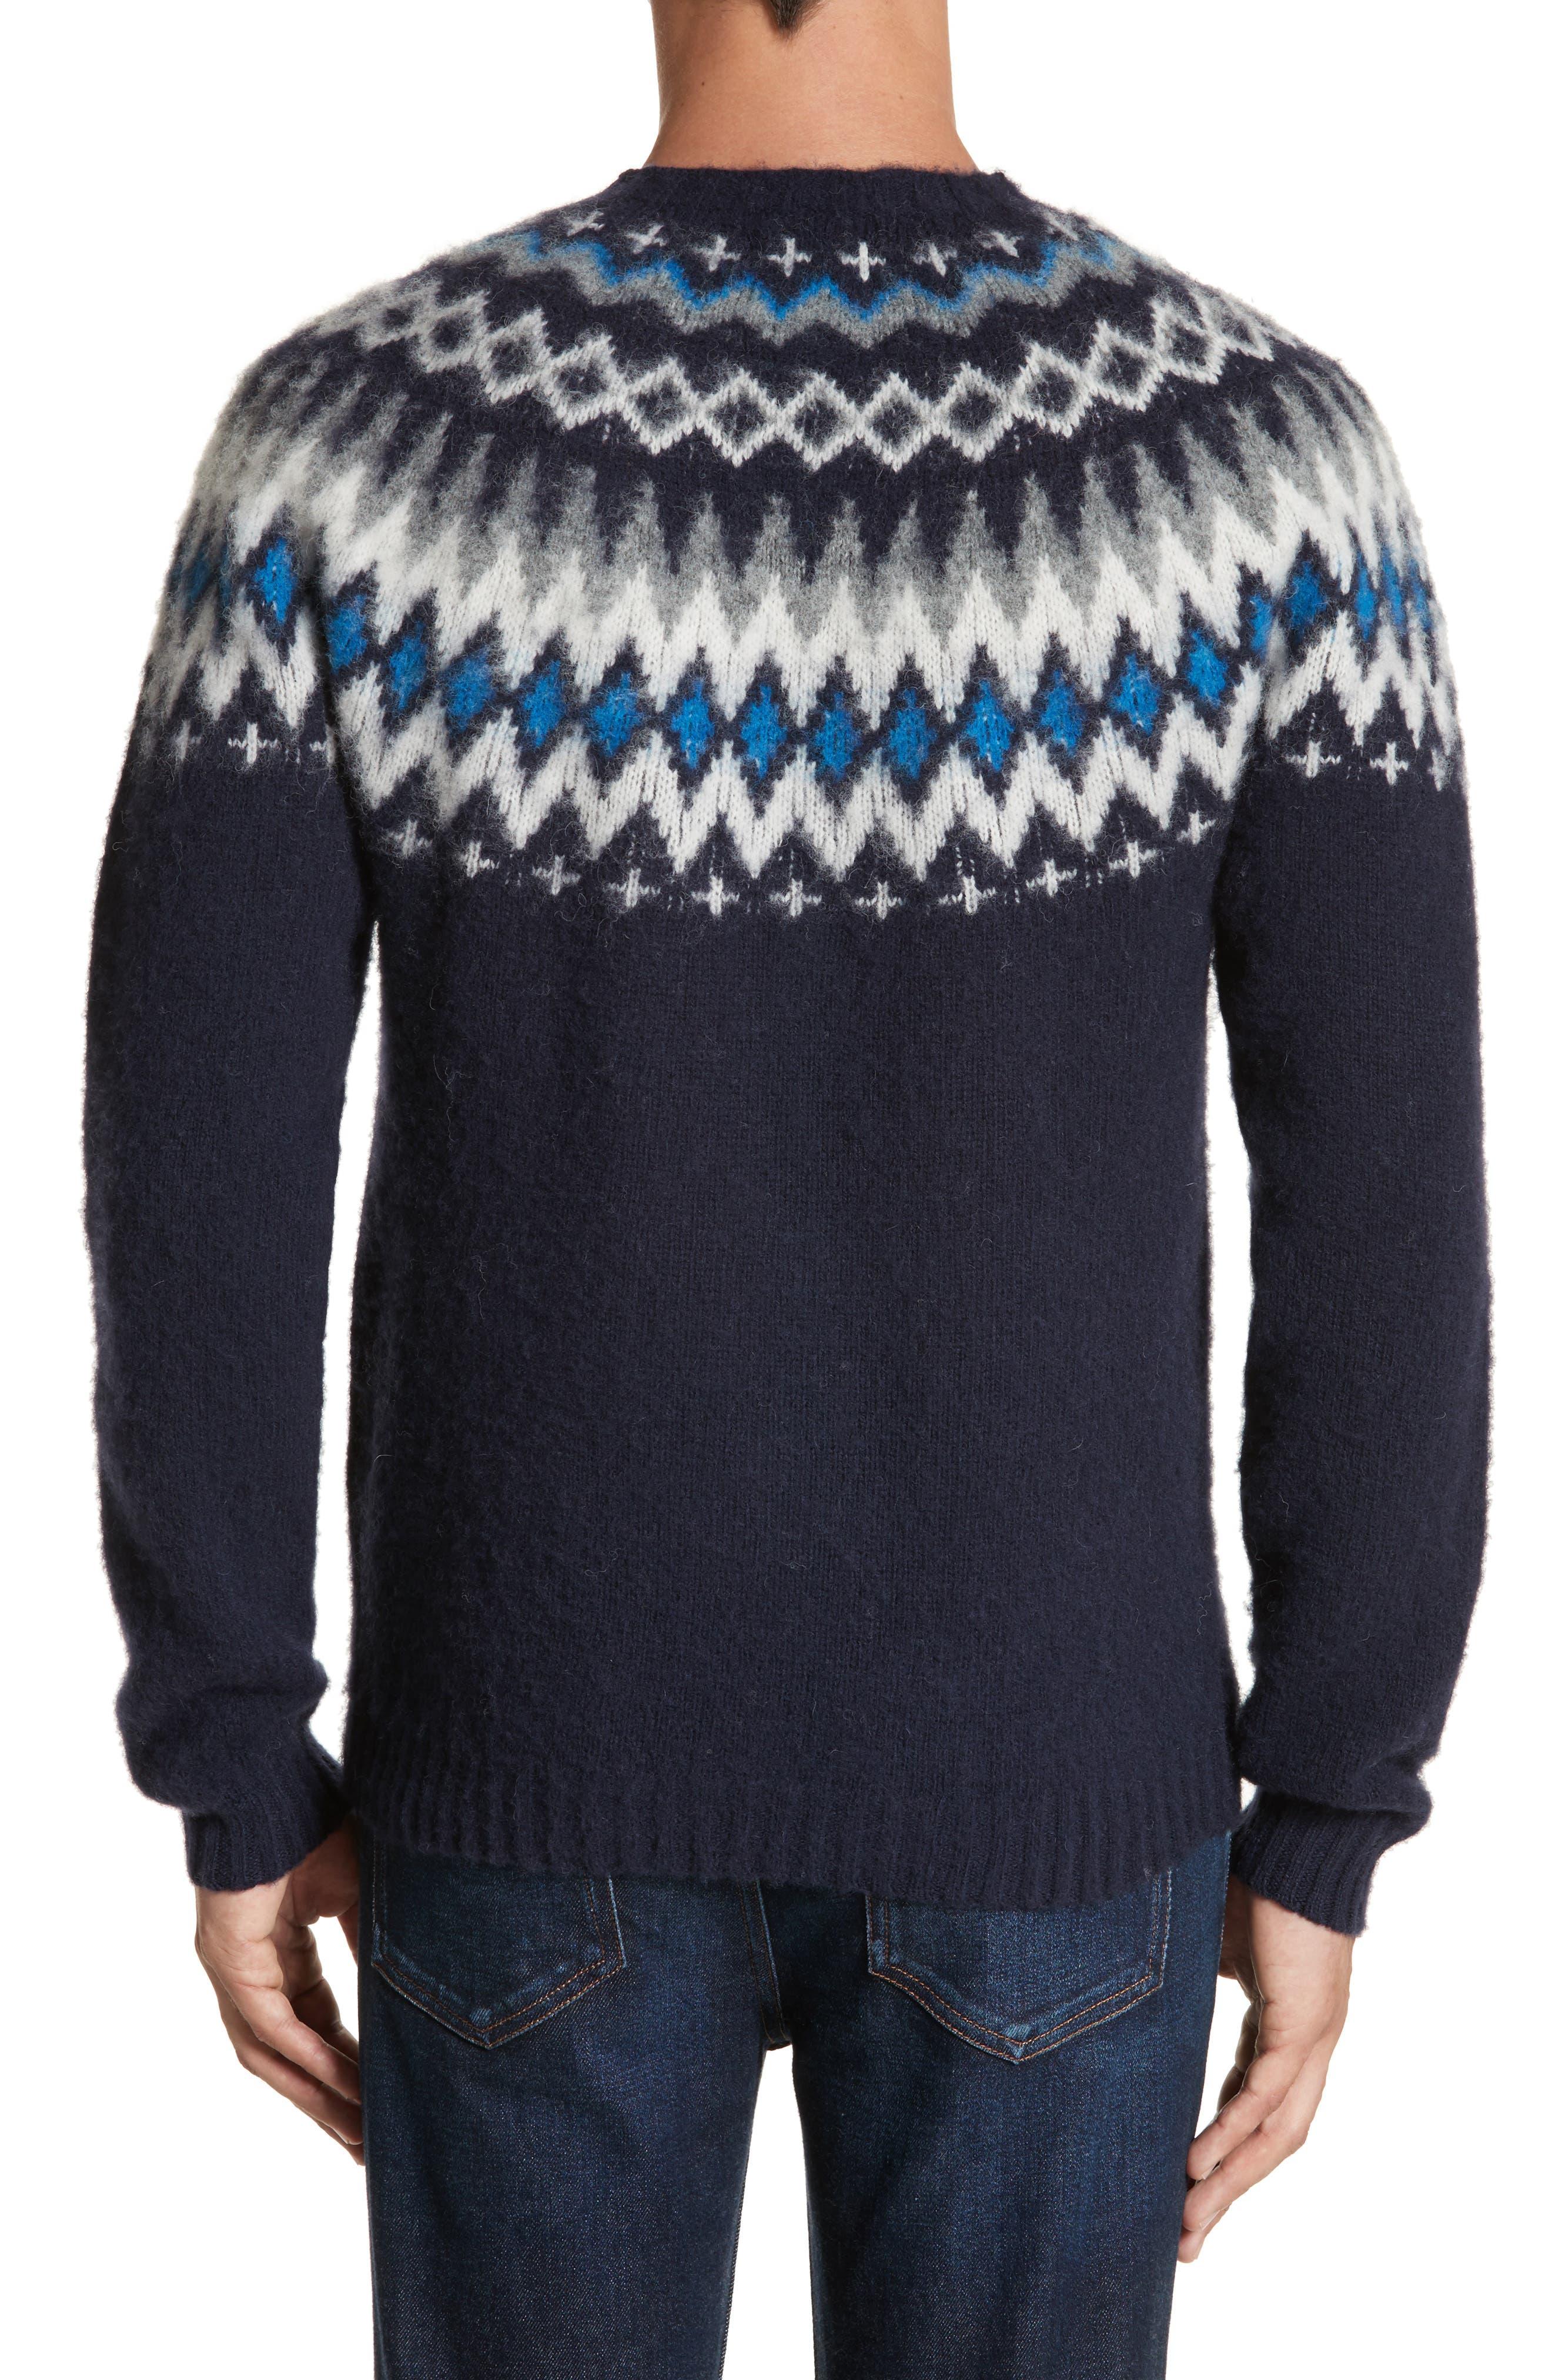 Nirnir Fair Isle Lambswool Sweater,                             Alternate thumbnail 2, color,                             Navy